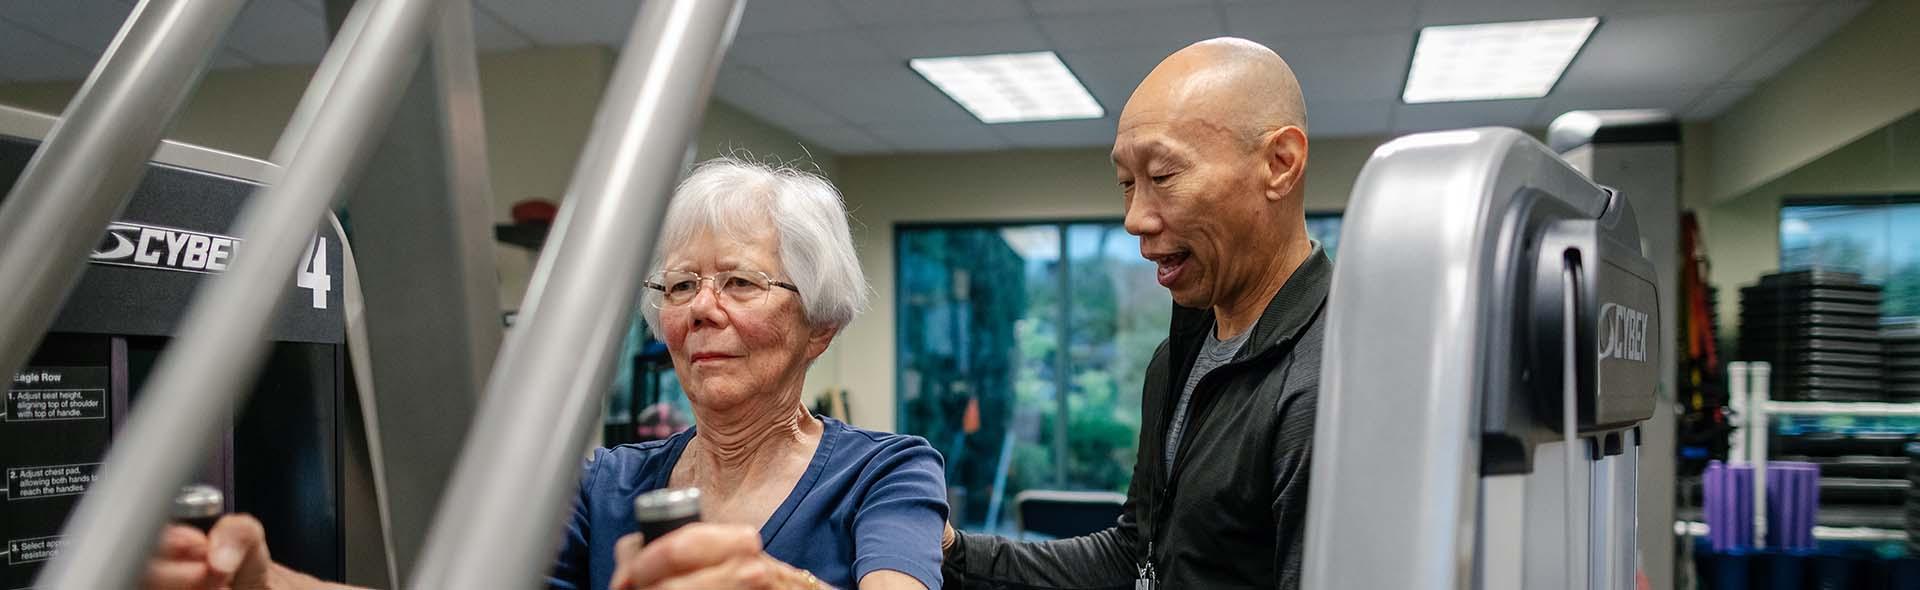 The Forum Senior Living Integrated Wellness